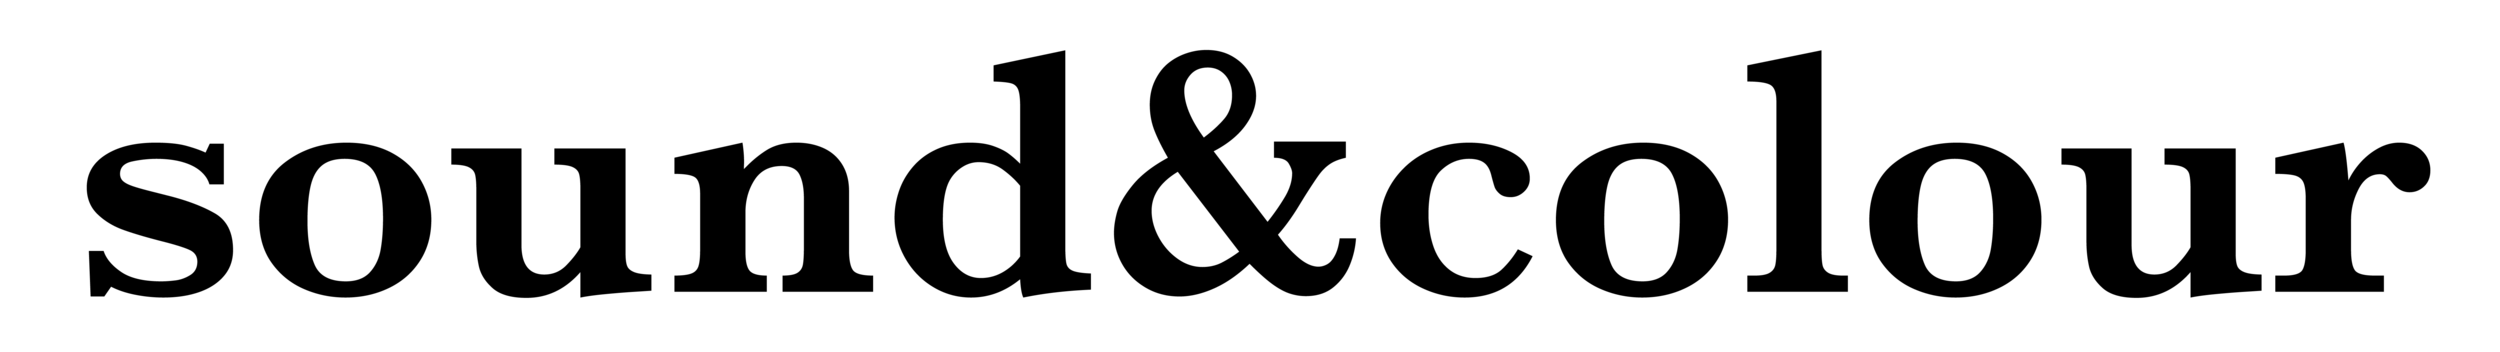 Sound&Colour-Logo-Real-Estate-Photography-Horizontal.png